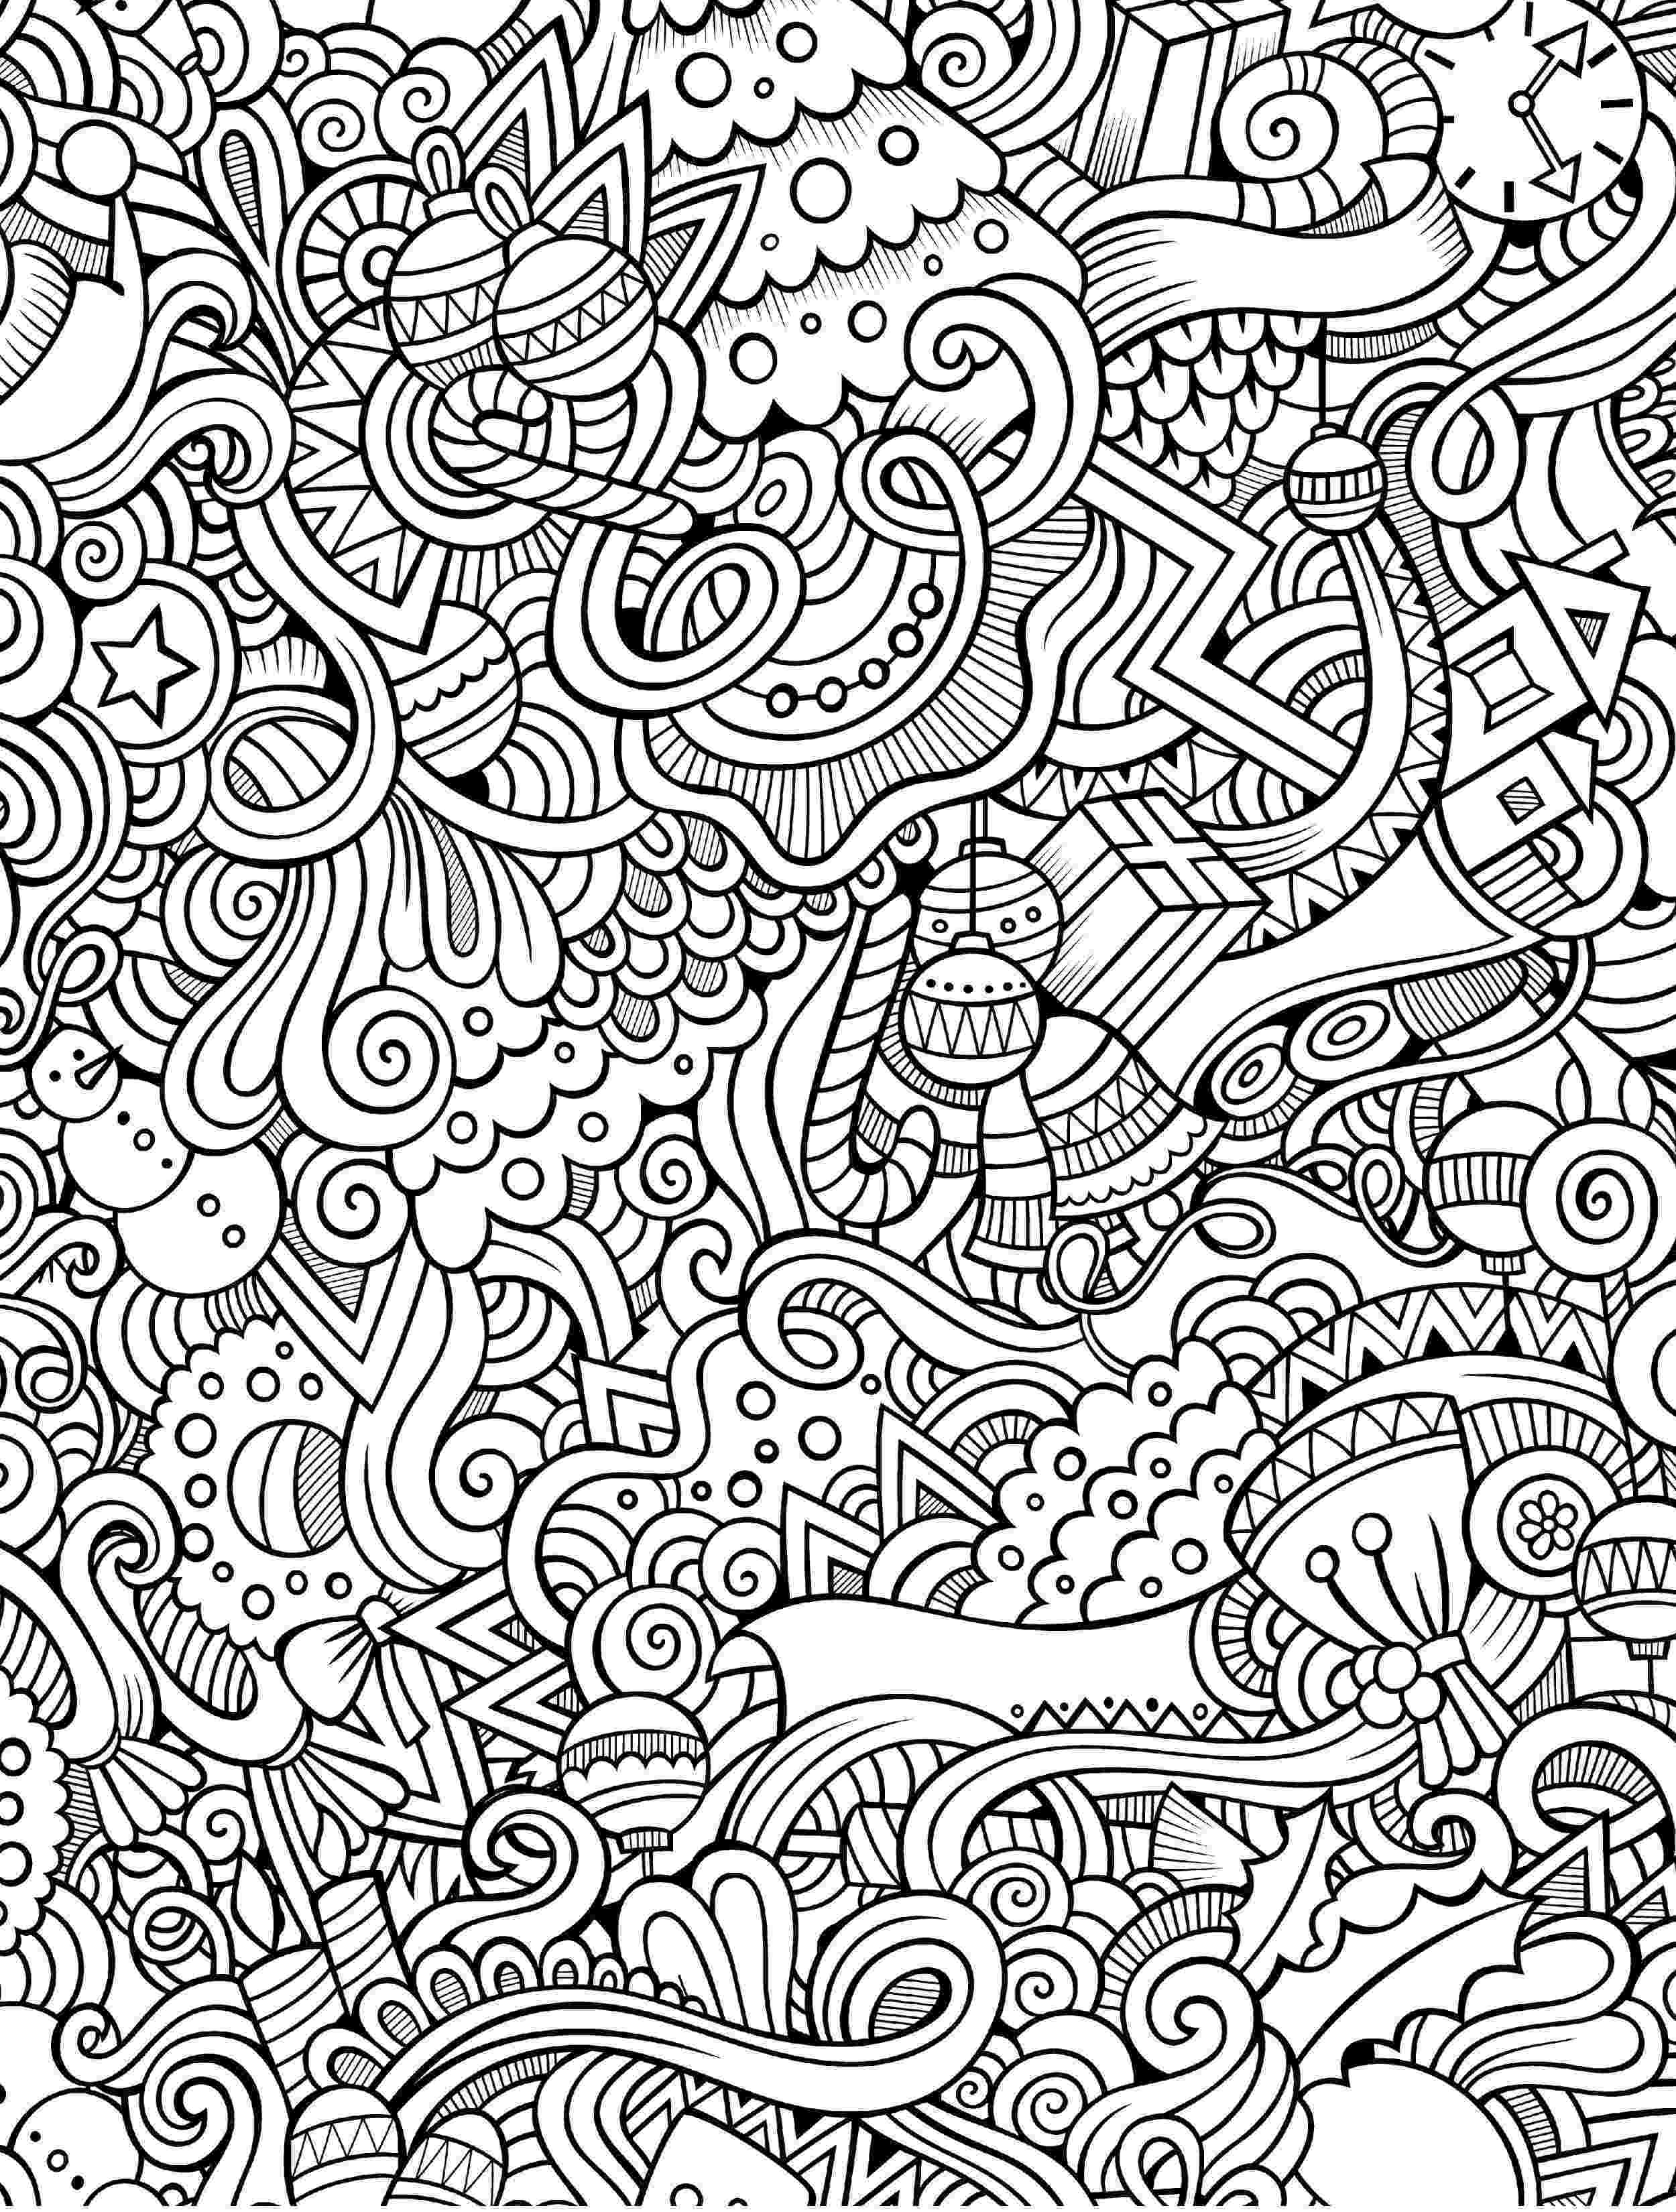 intricate coloring pages intricate coloring pages pdf coloring home intricate pages coloring